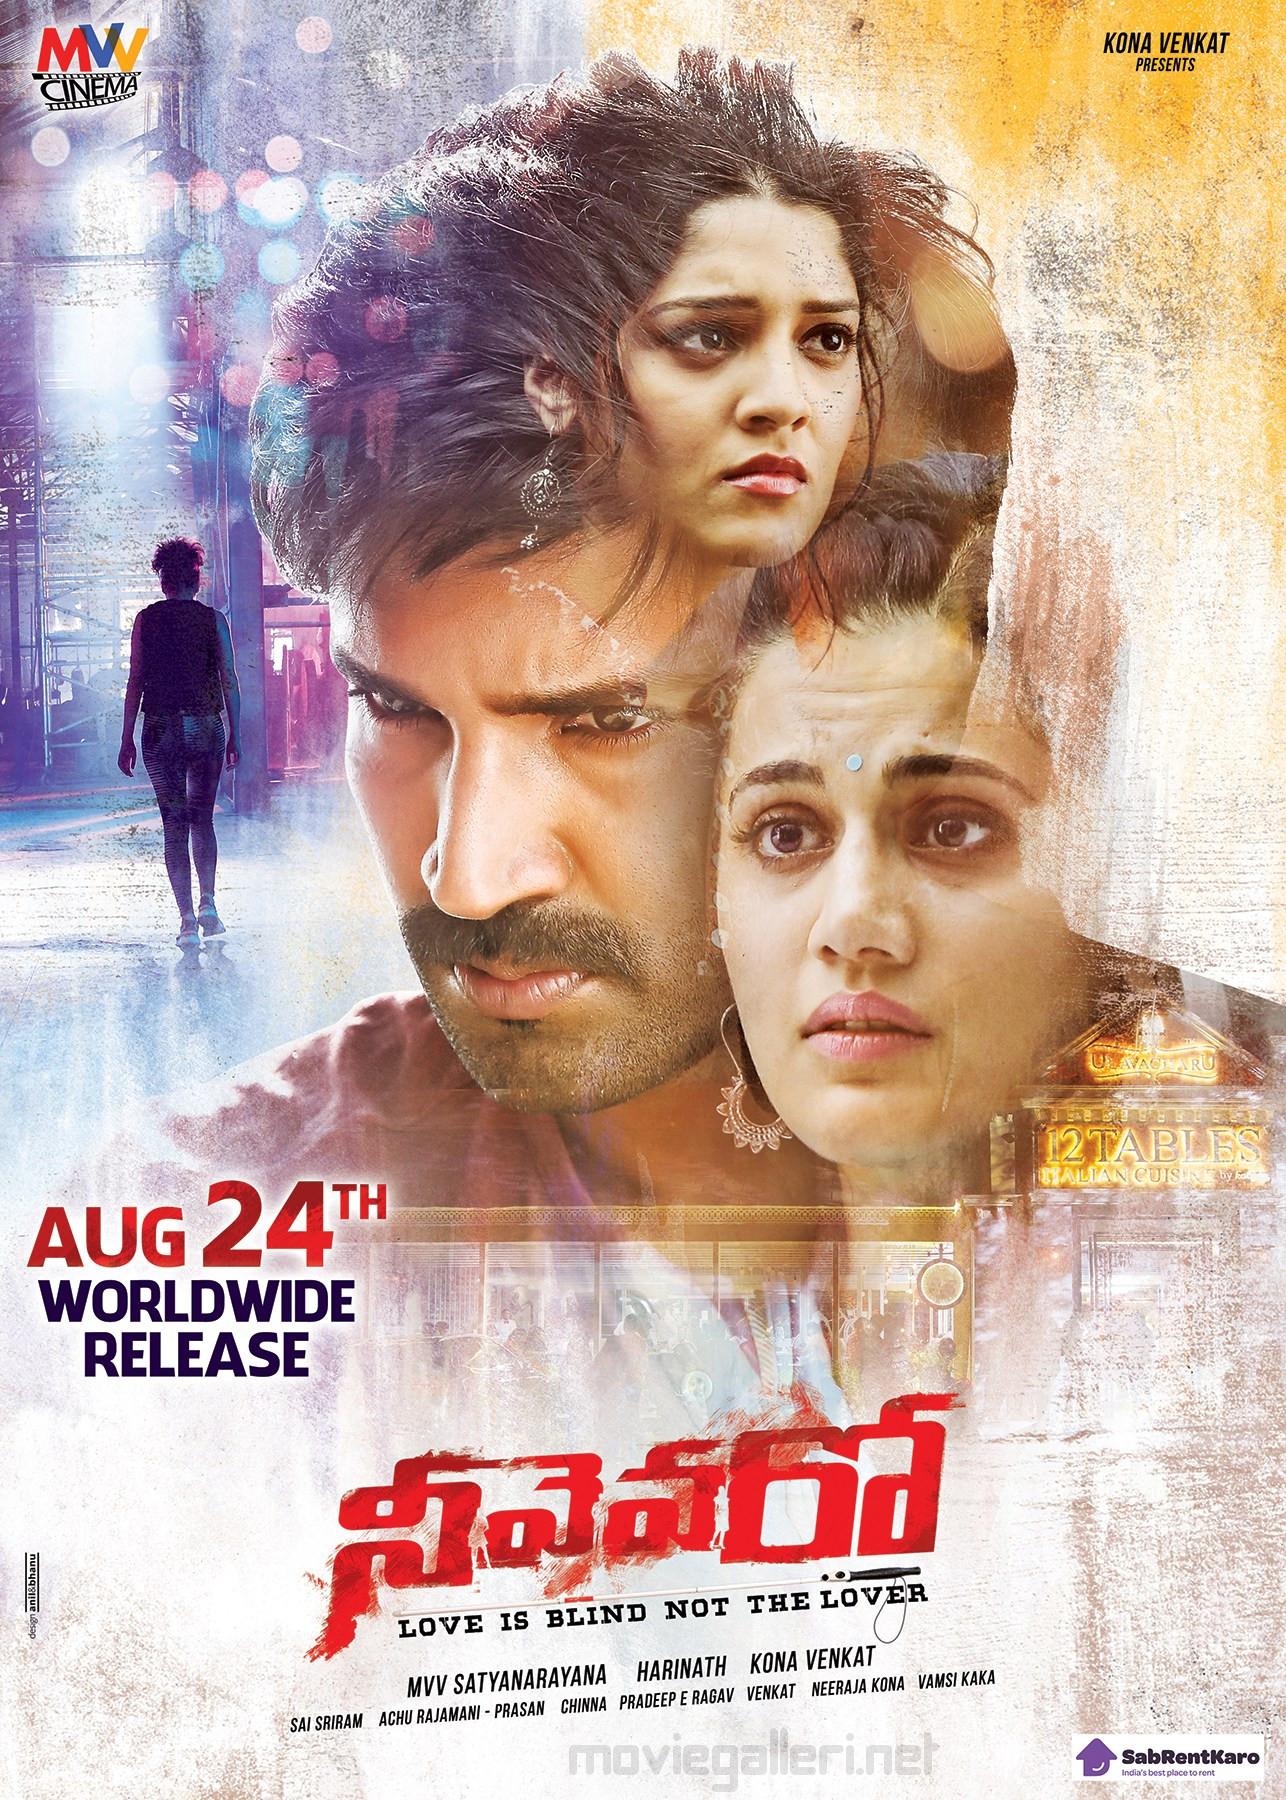 Aadhi Pinisetty, Taapsee Pannu & Ritika Singh Neevevaro Movie Release Date on 24 August Poster HD